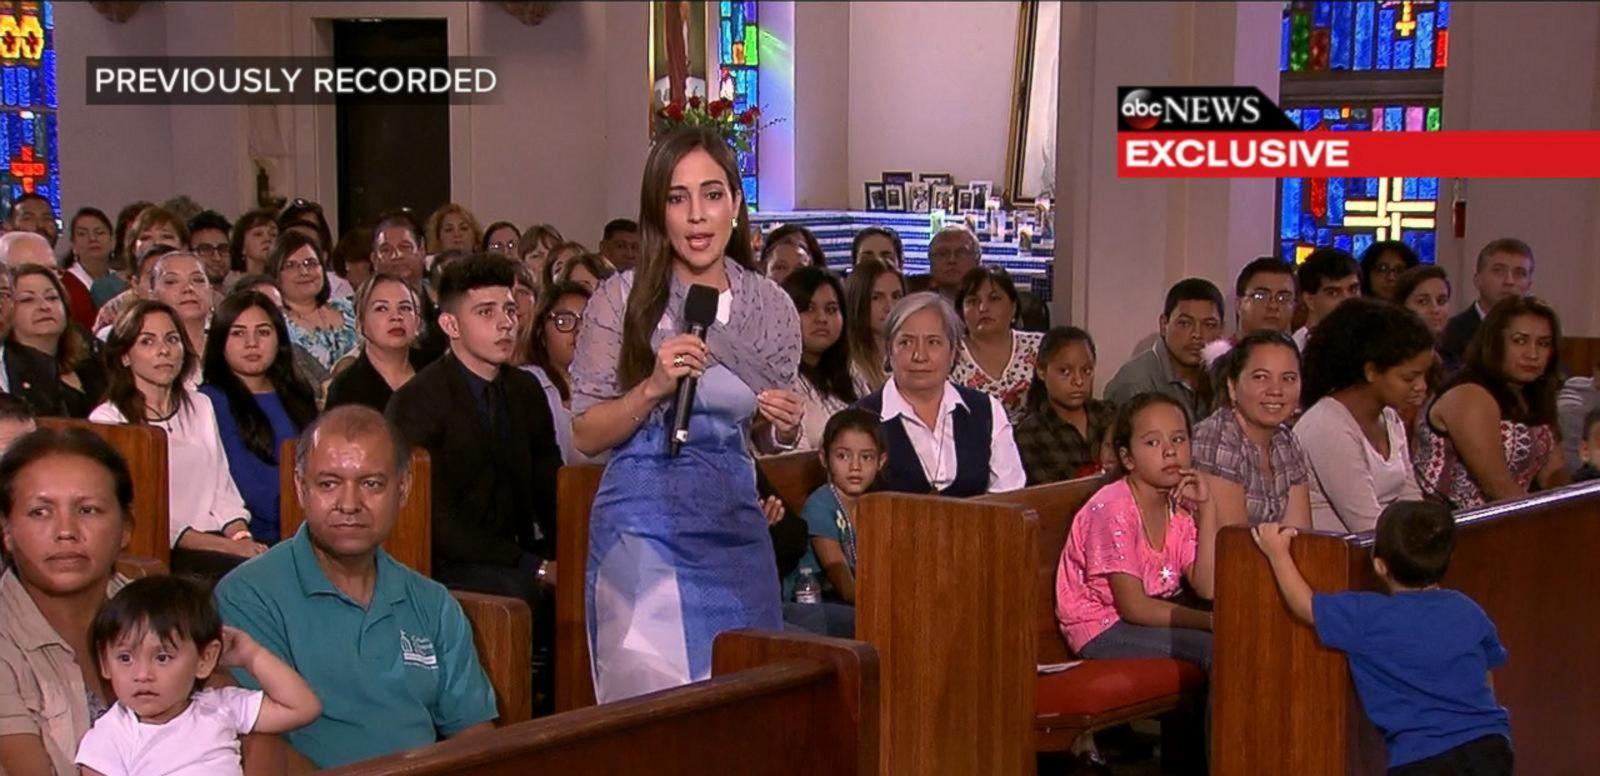 VIDEO: Texas Church Participates in Virtual Papal Audience